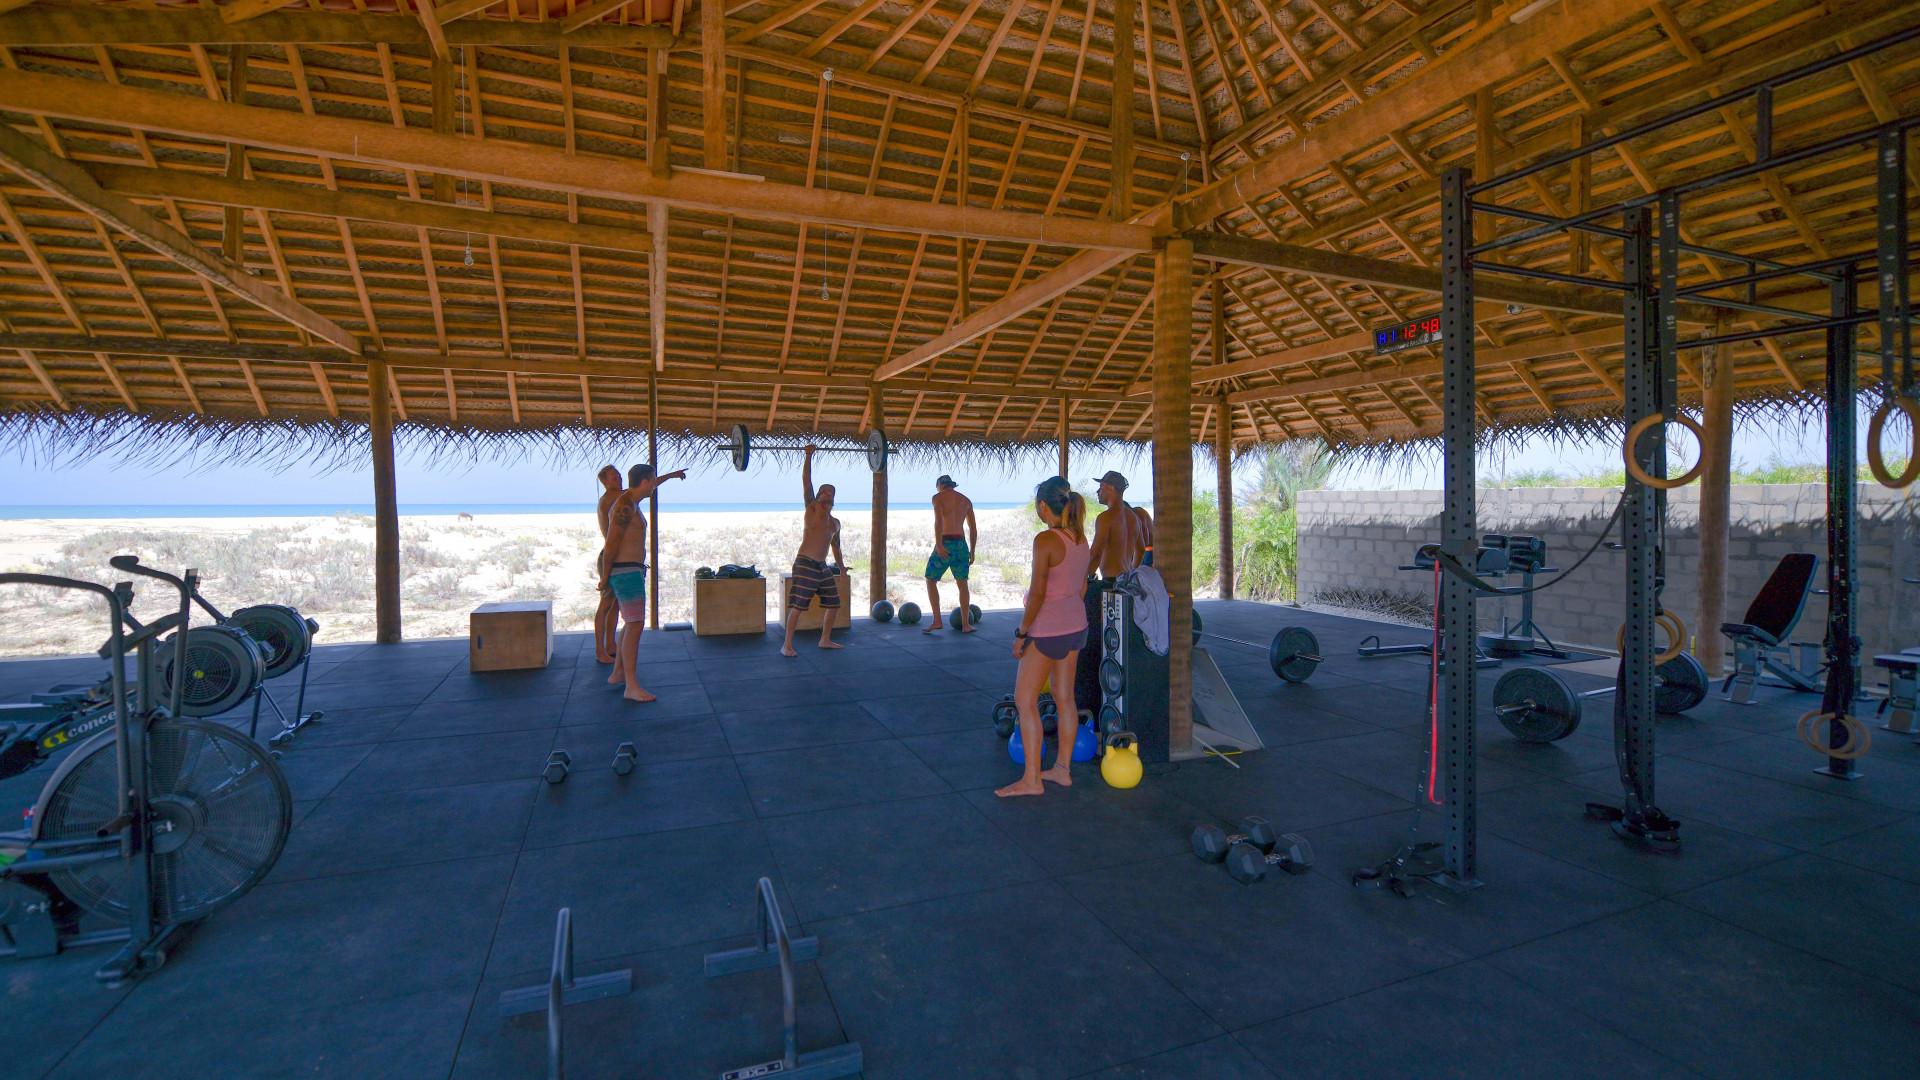 The BNKR Indian Ocean boot camp